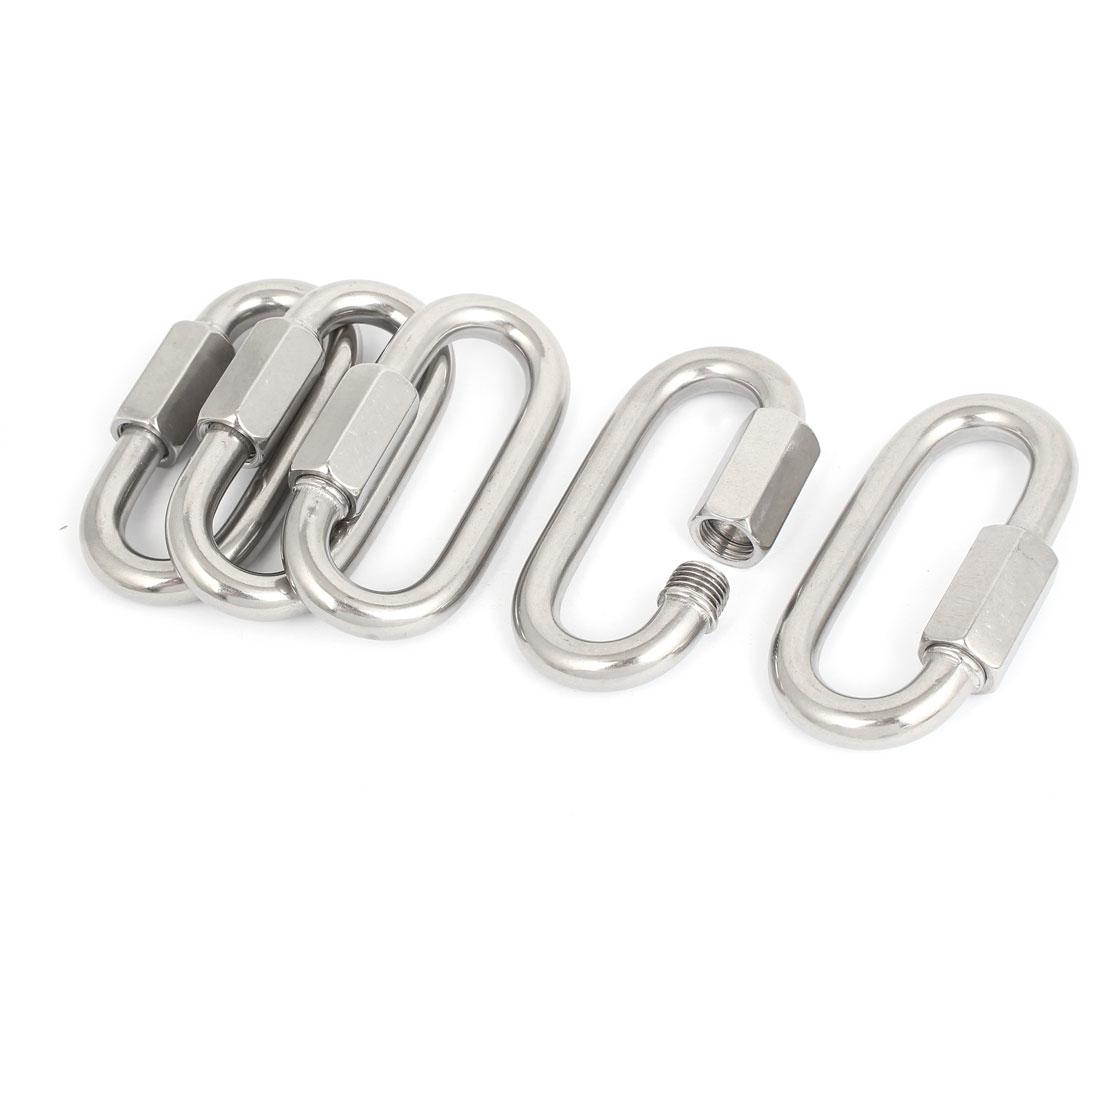 M12 Multifunctional Oval Quick Screwlock Link Lock Carabiner Silver Tone 5pcs